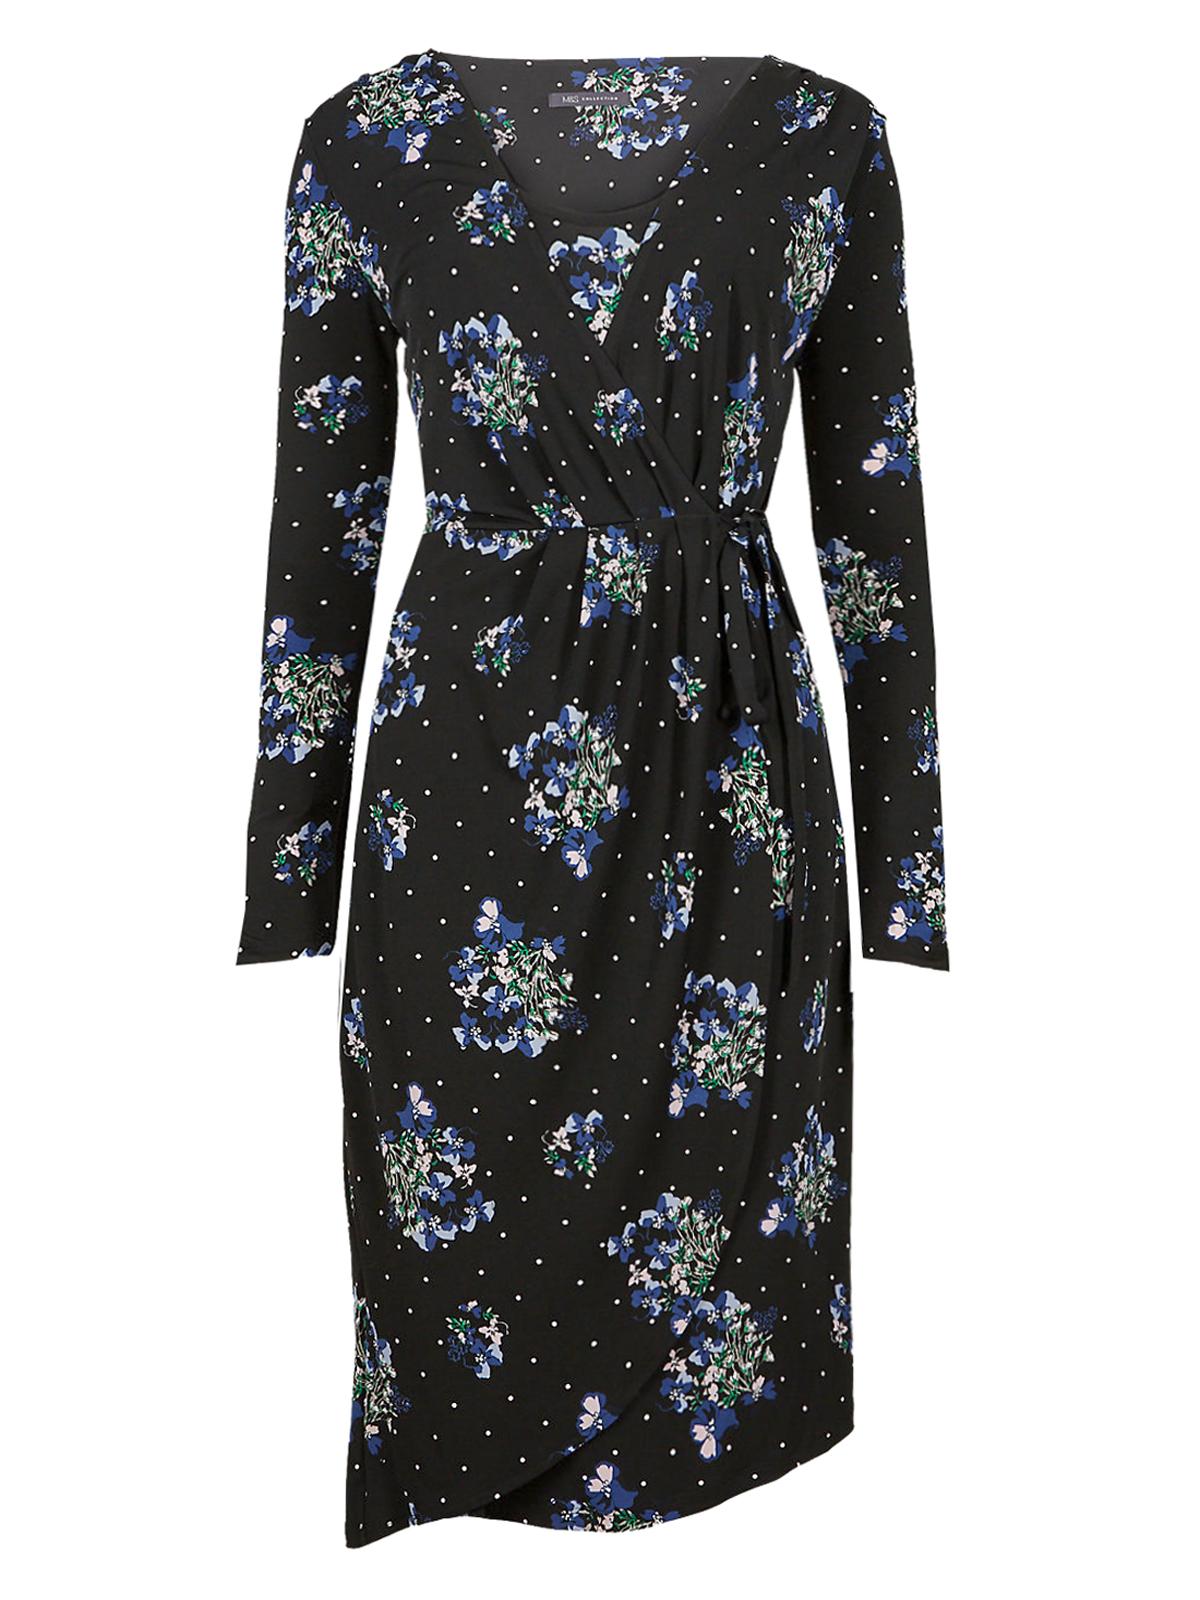 74dc055dede9d Marks and Spencer - - M&5 BLACK Floral Print Asymmetric Wrap Midi Dress -  Size 6 to 22